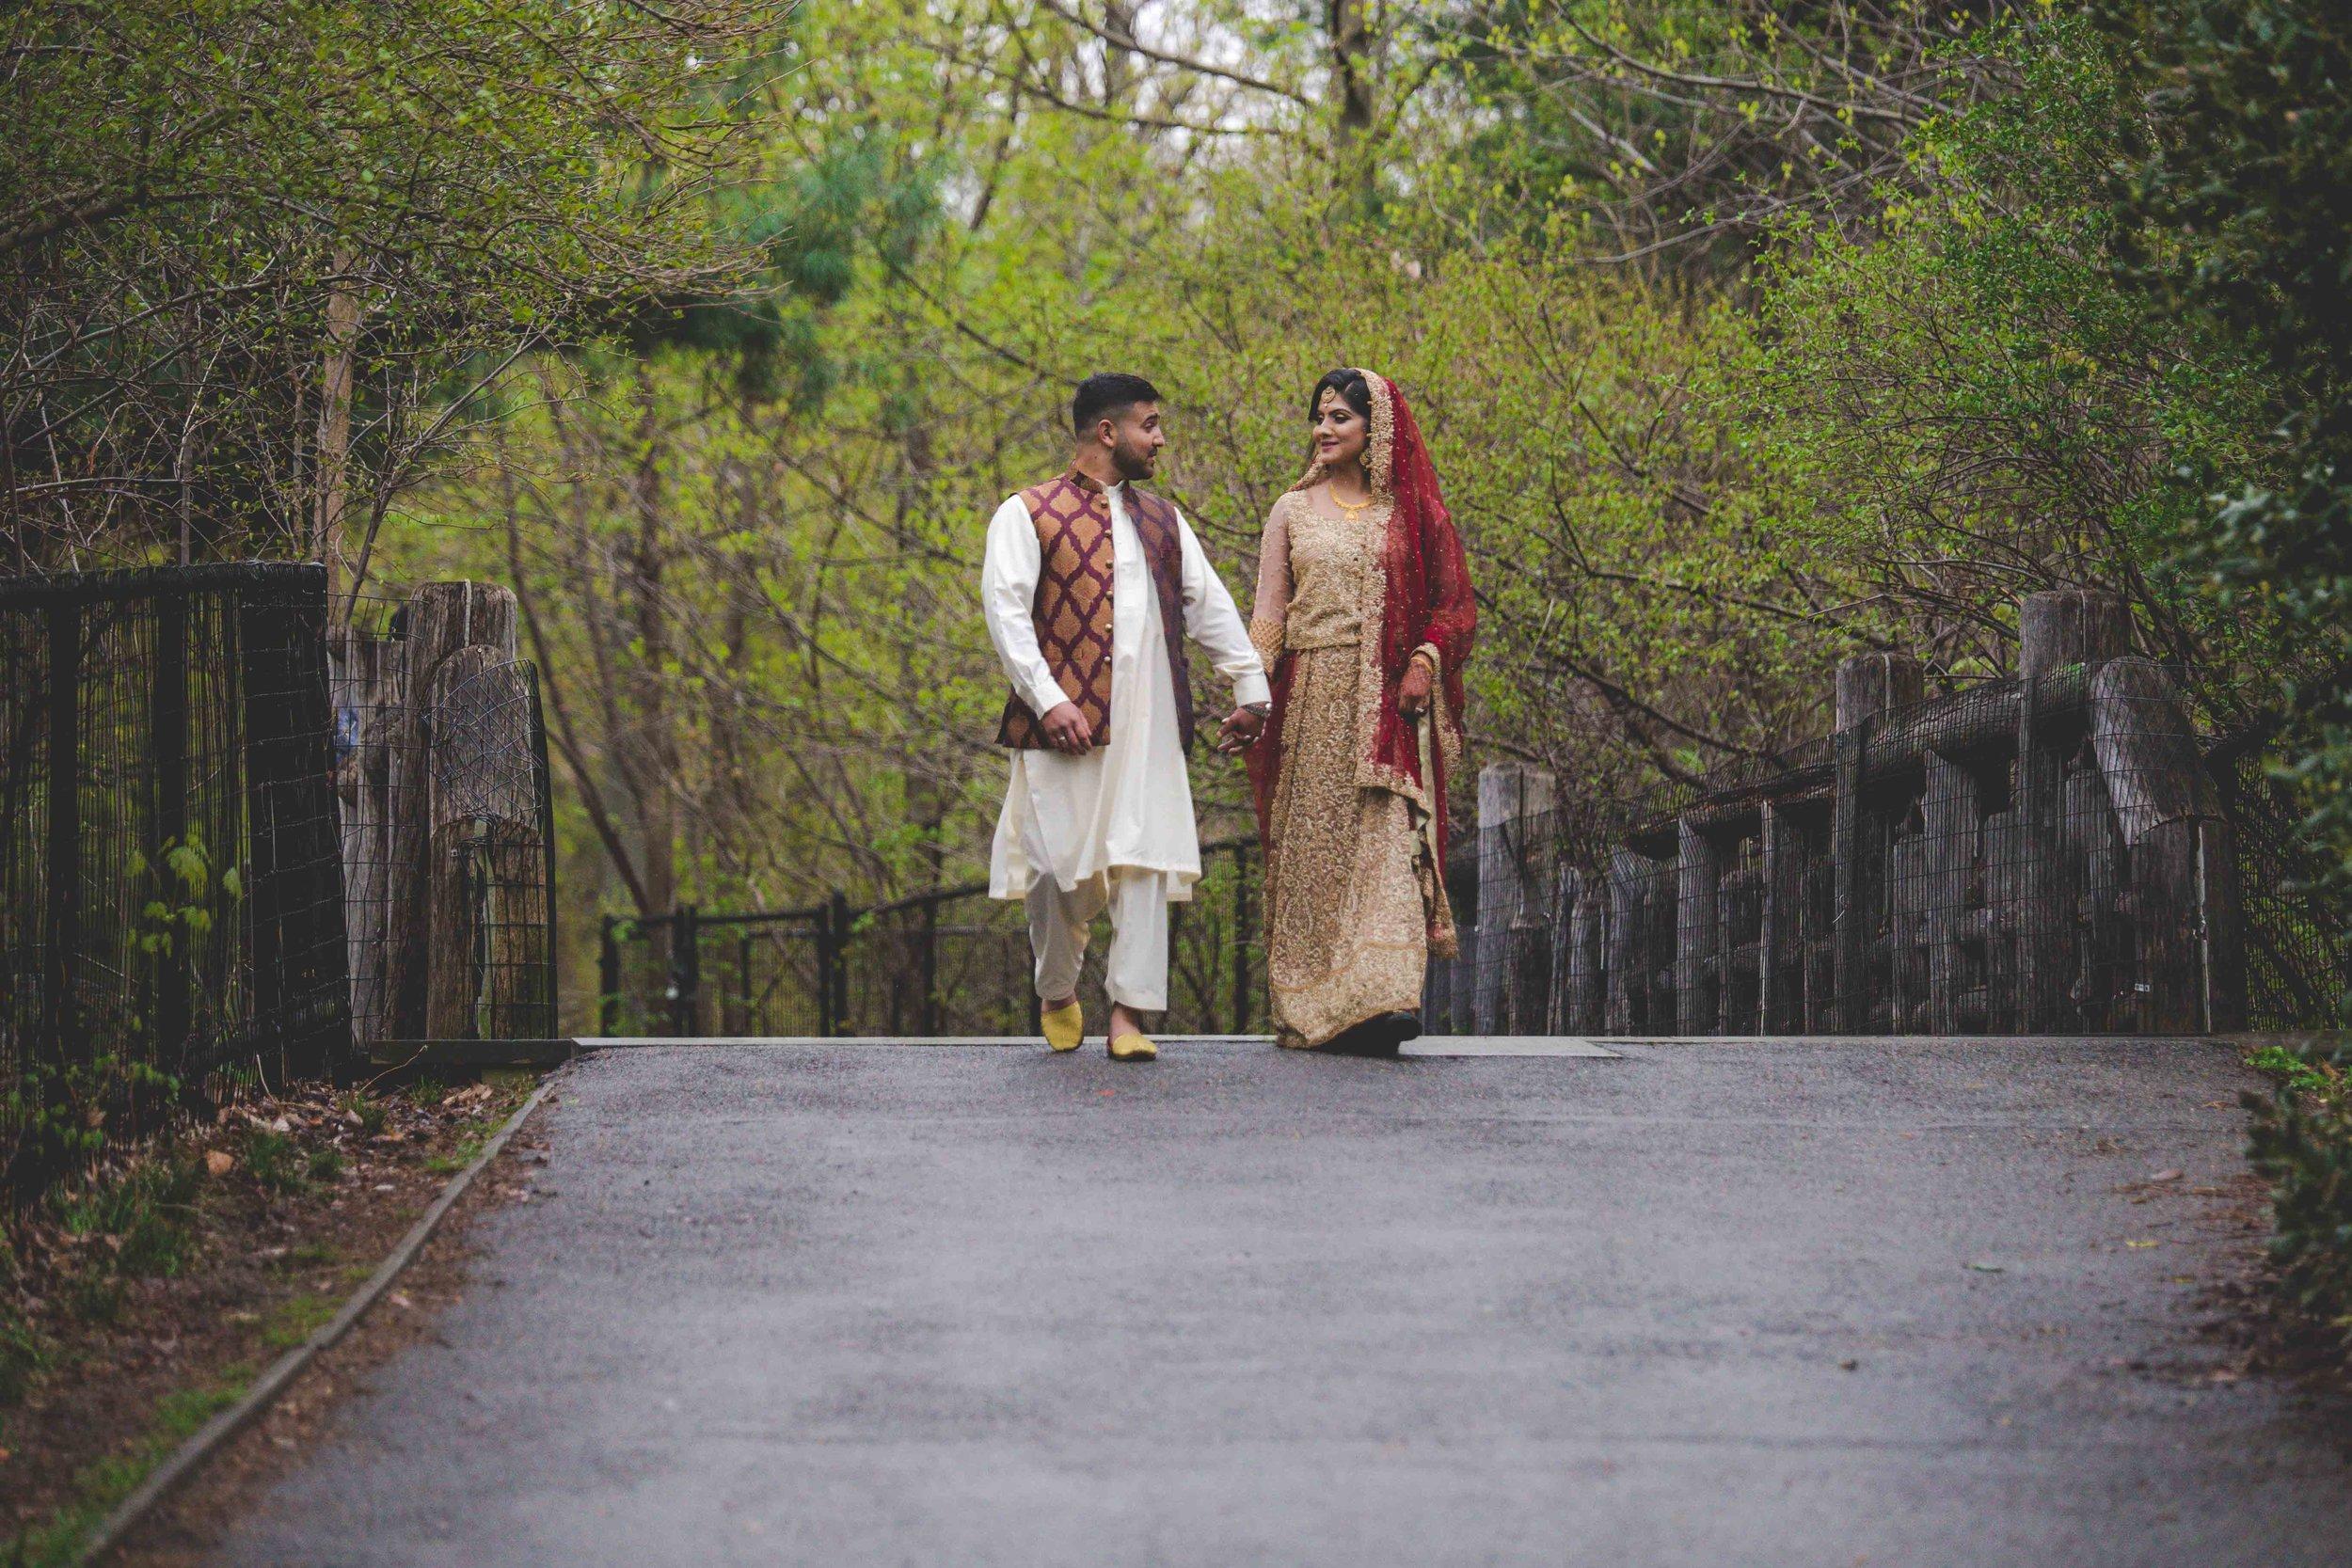 pakistani-wedding-photographer-brooklyn-new-york-55.jpg